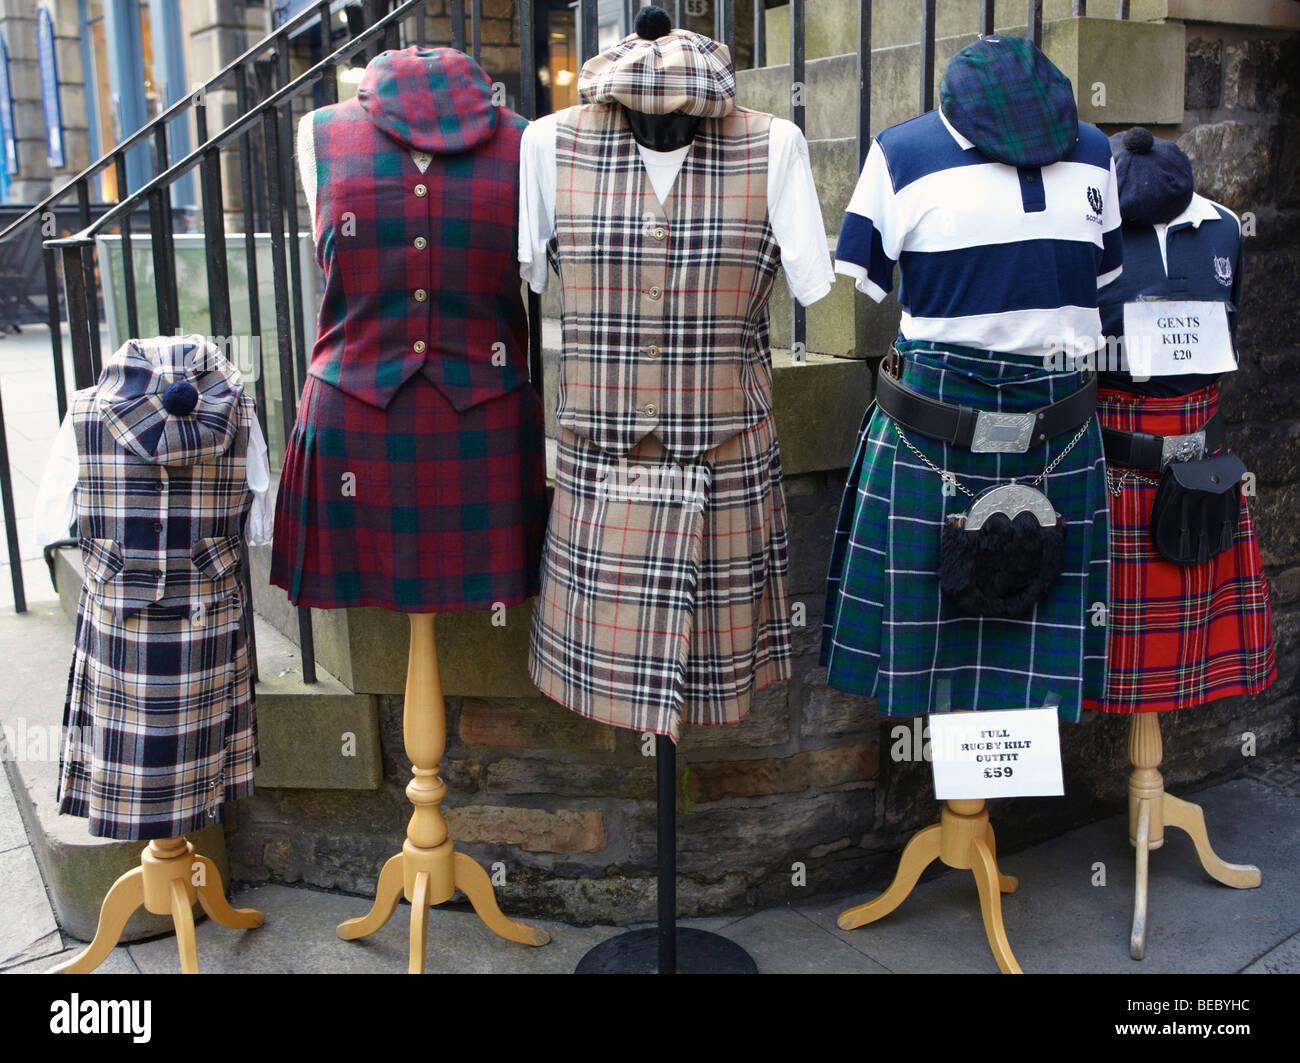 Tartan Shop Edinburgh Scotland UK Stock Photo: 26078680 - Alamy